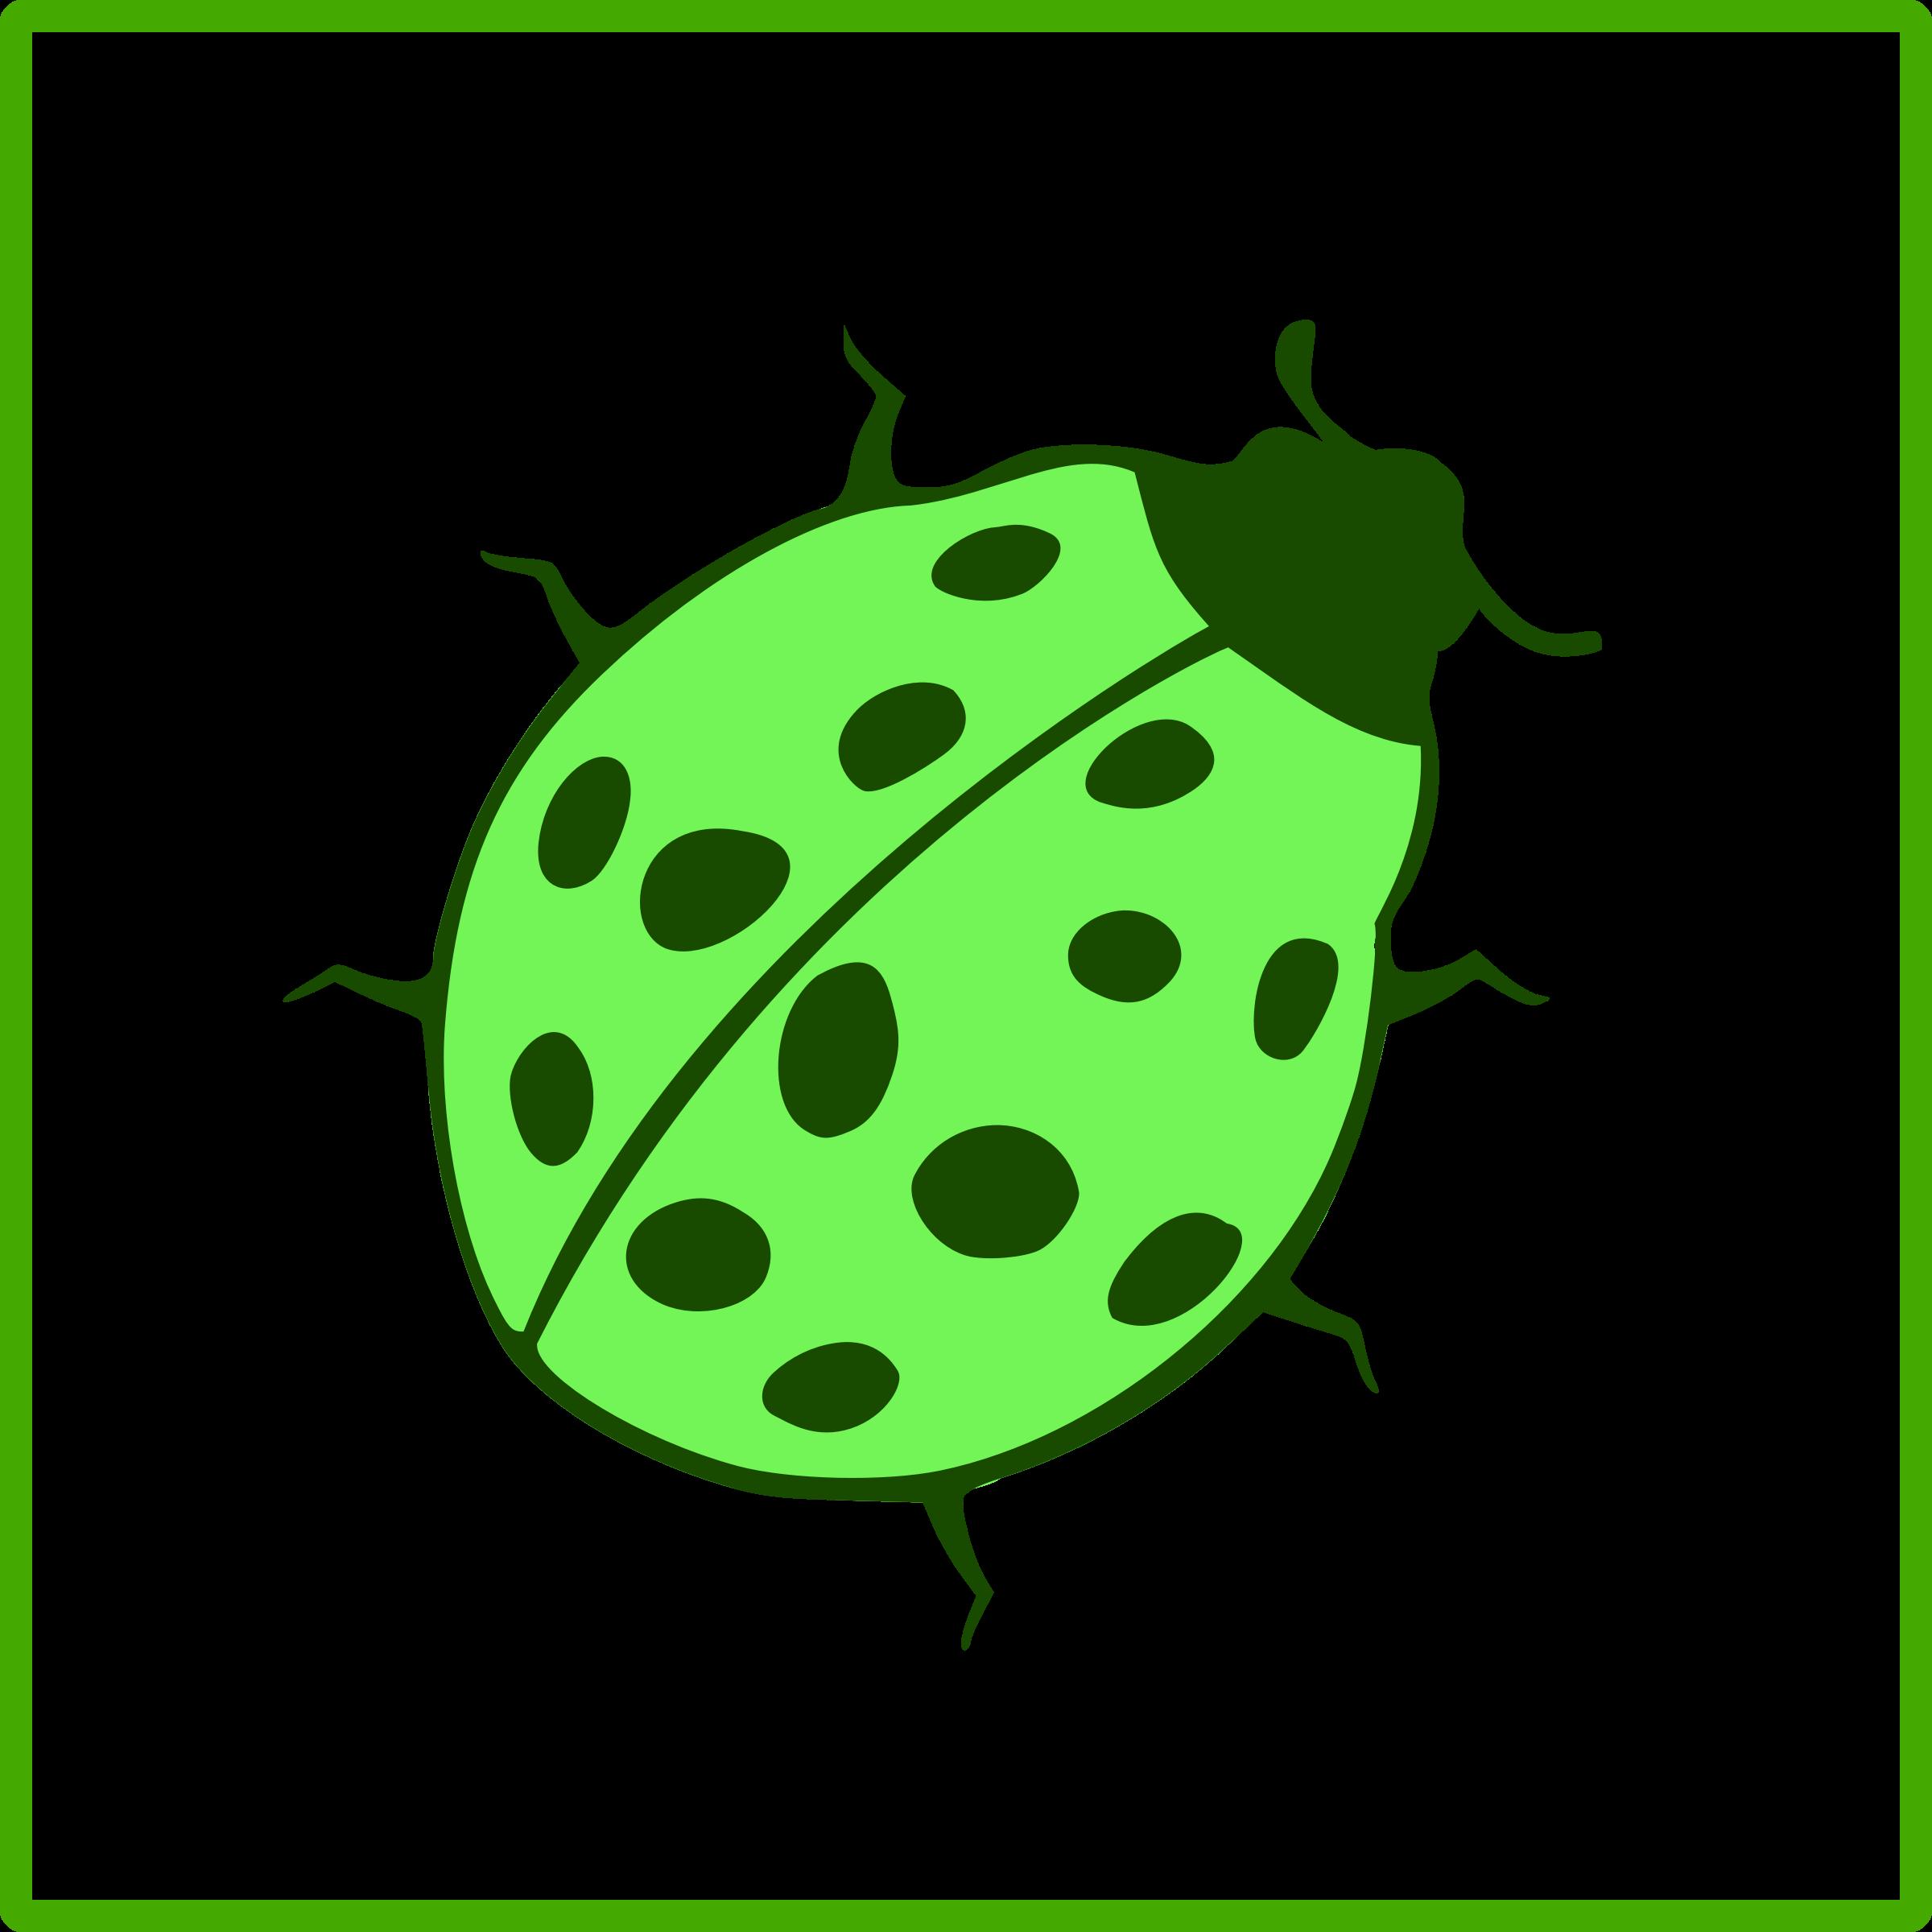 Beelte clipart green Green Clipart icon eco eco